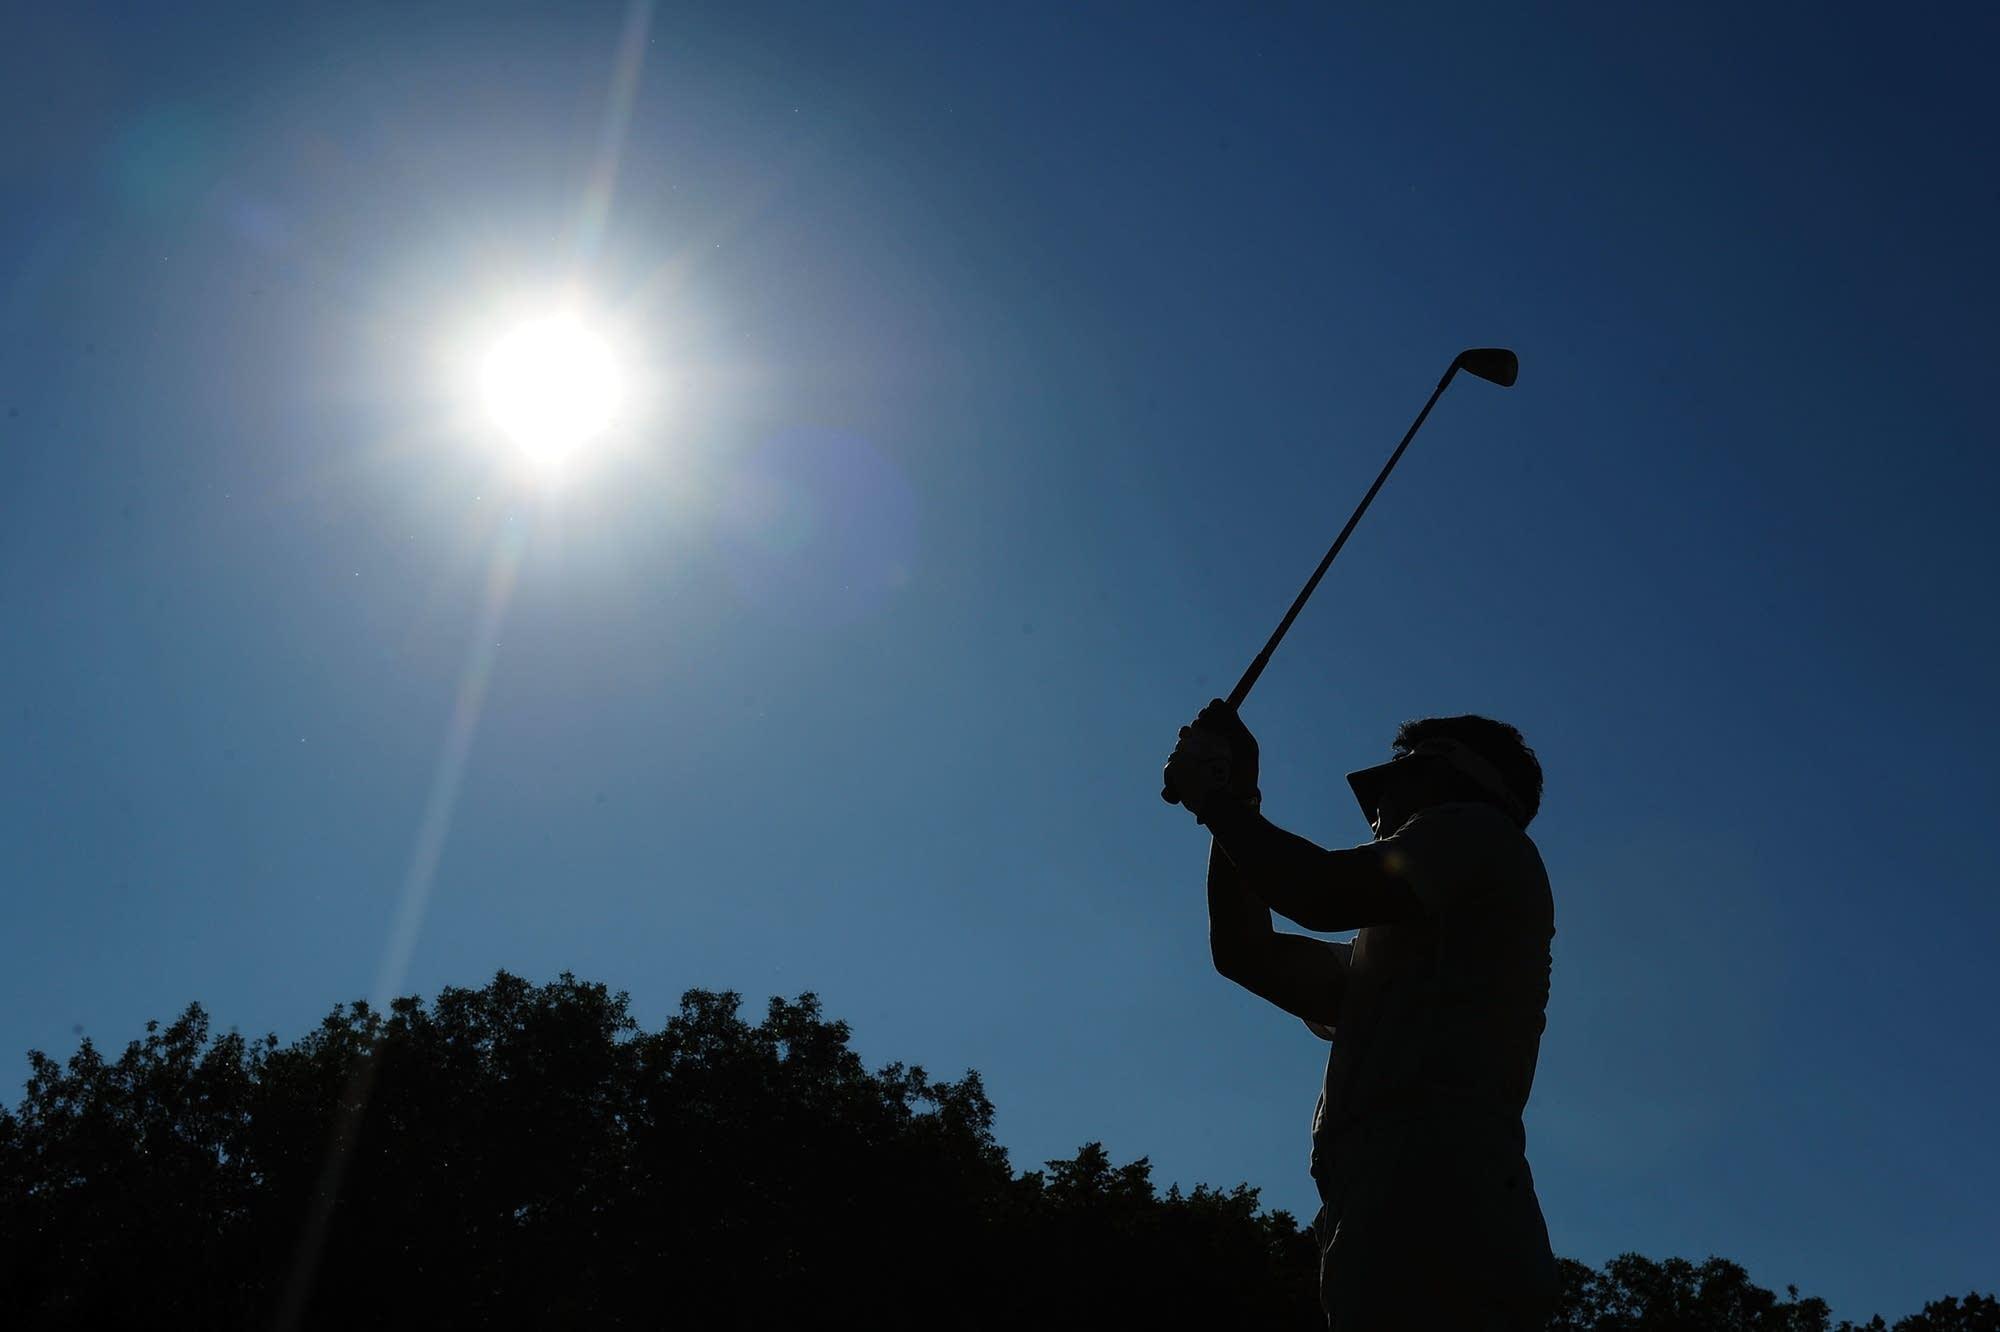 Y.E. Yang plays his tee shot at Hazeltine National Golf Club.